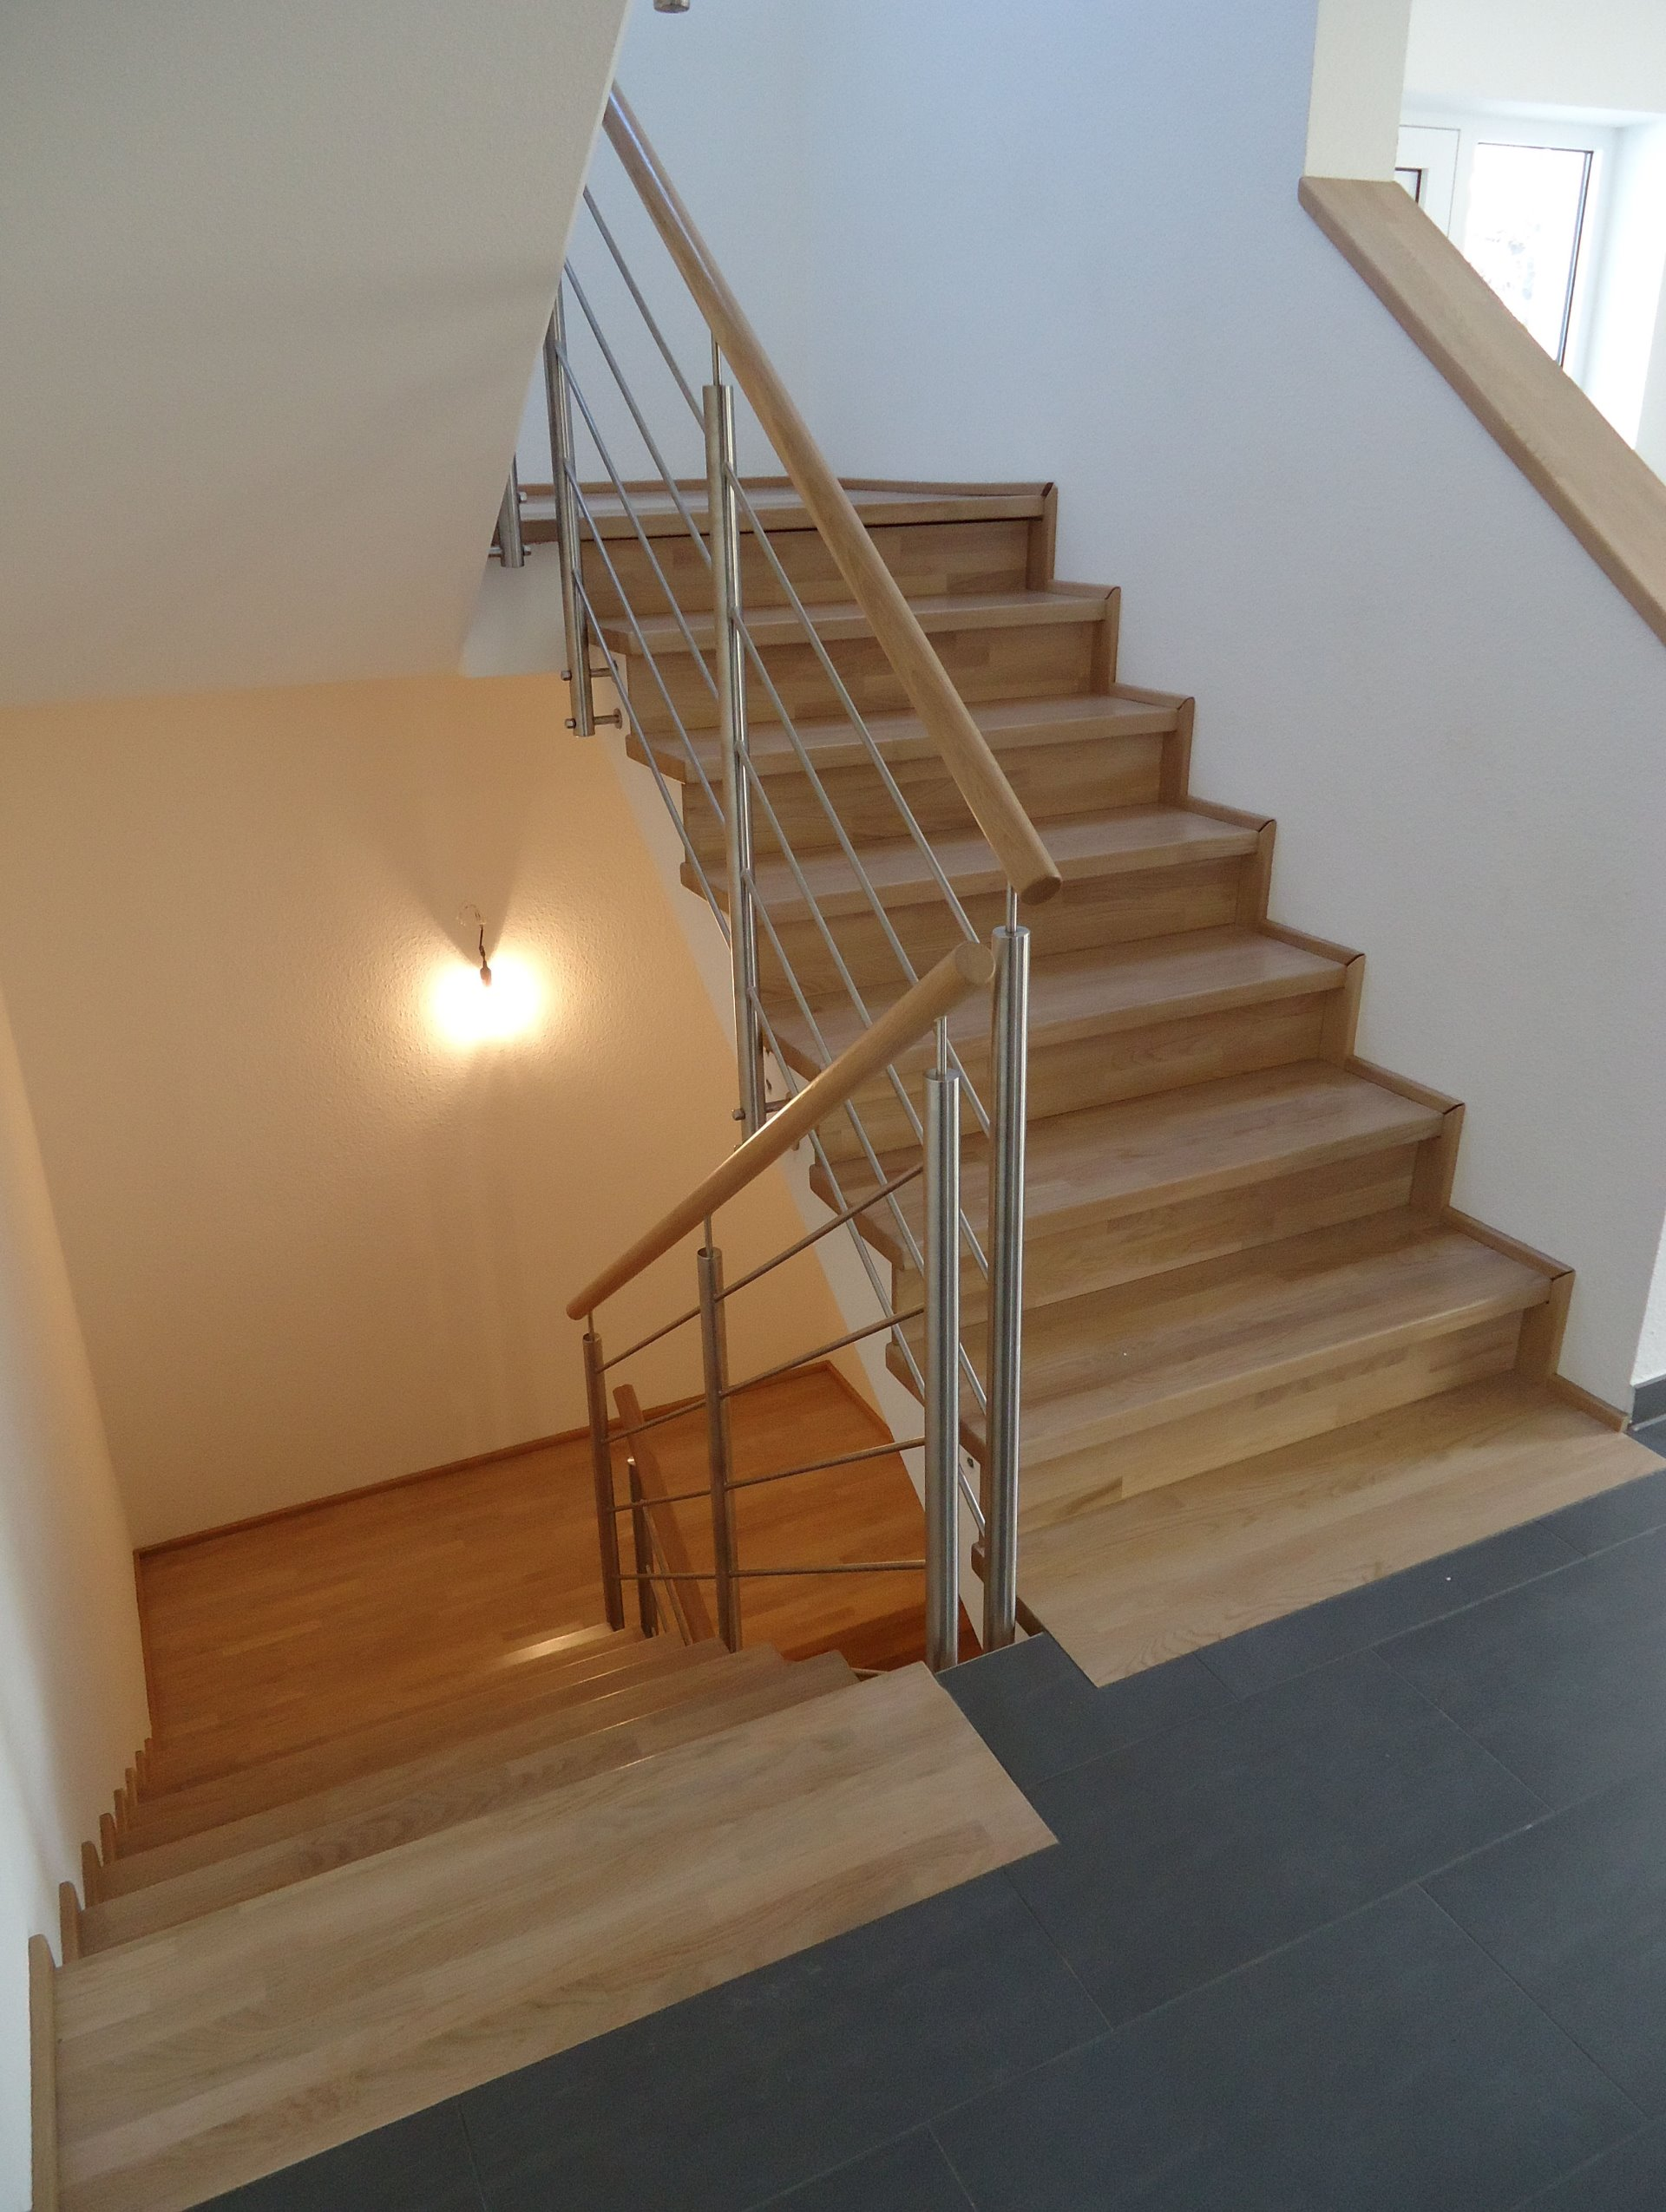 treppe mit podest treppe mit podest mit podest auaentreppe mit podest treppe mit podest. Black Bedroom Furniture Sets. Home Design Ideas